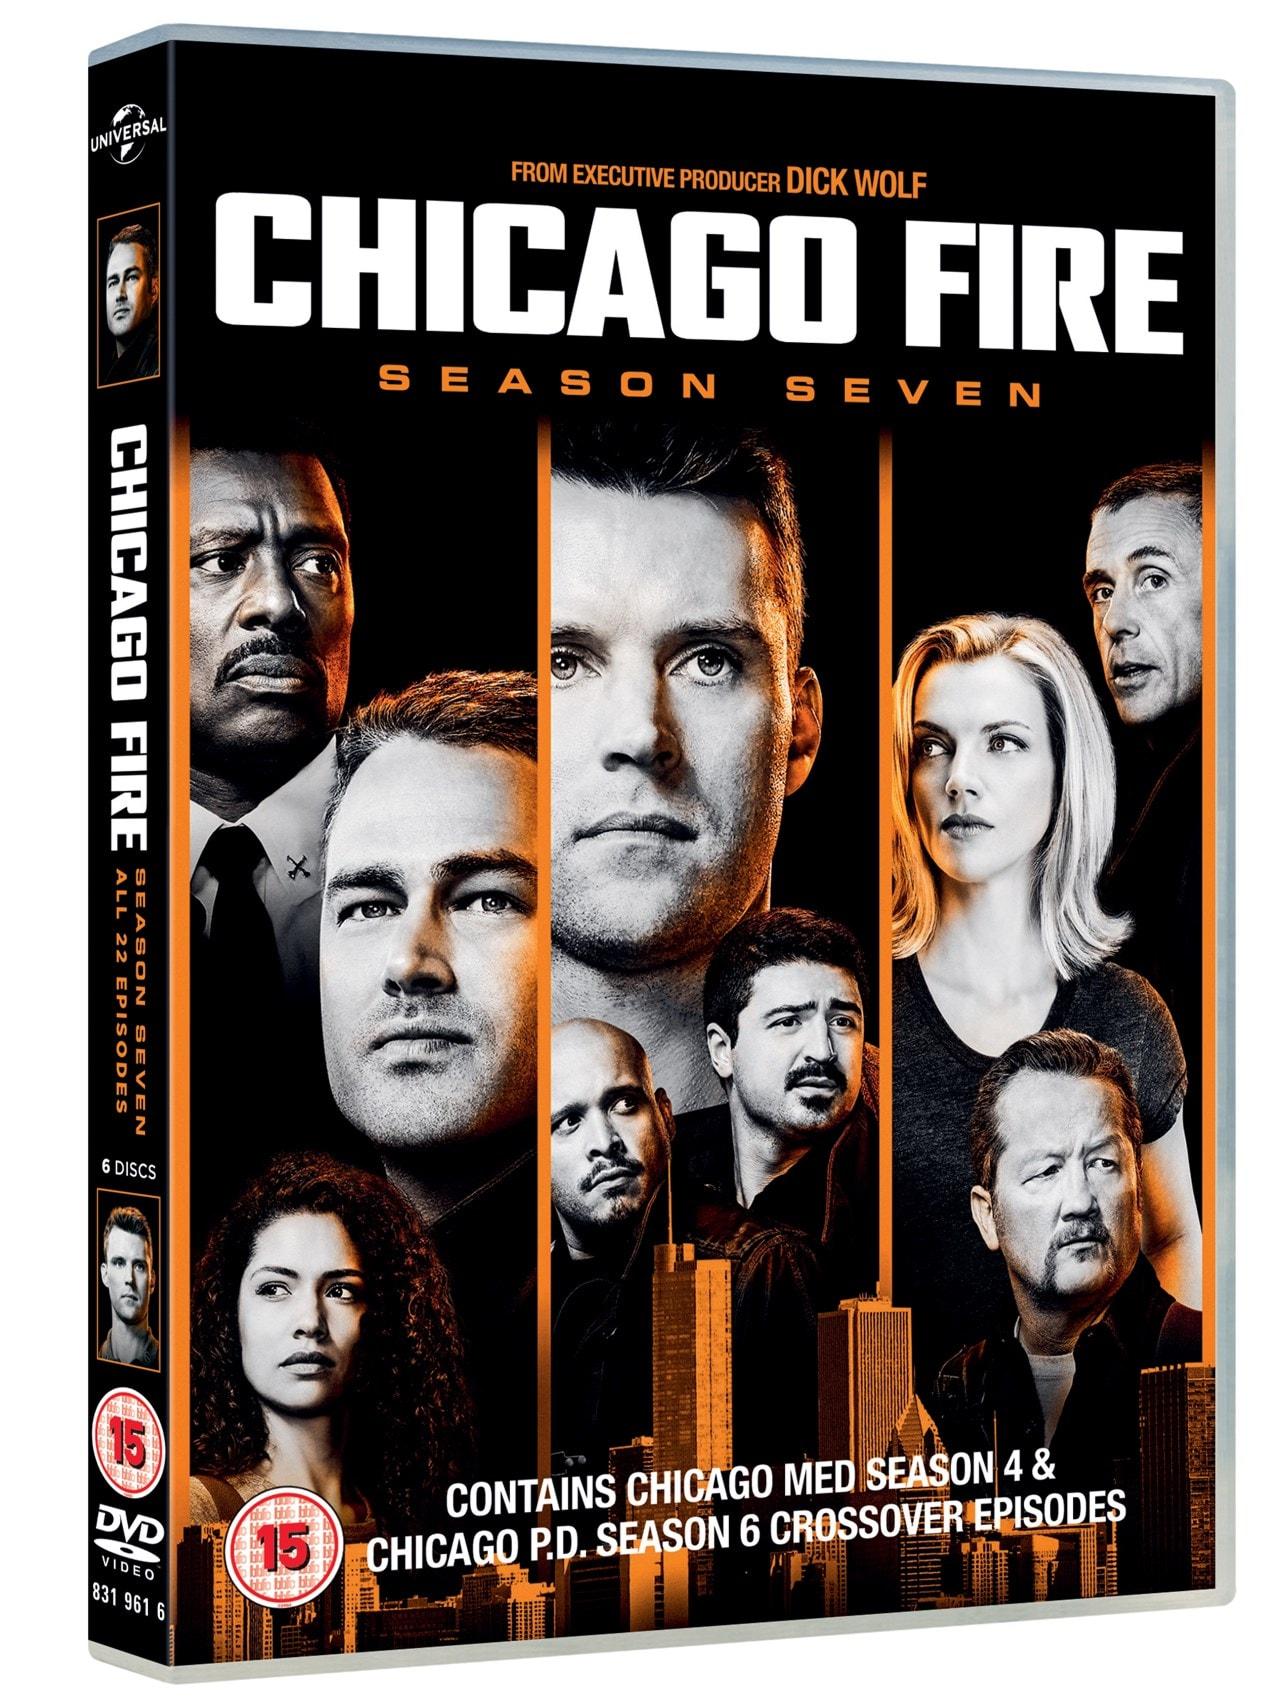 Chicago Fire: Season Seven - 2